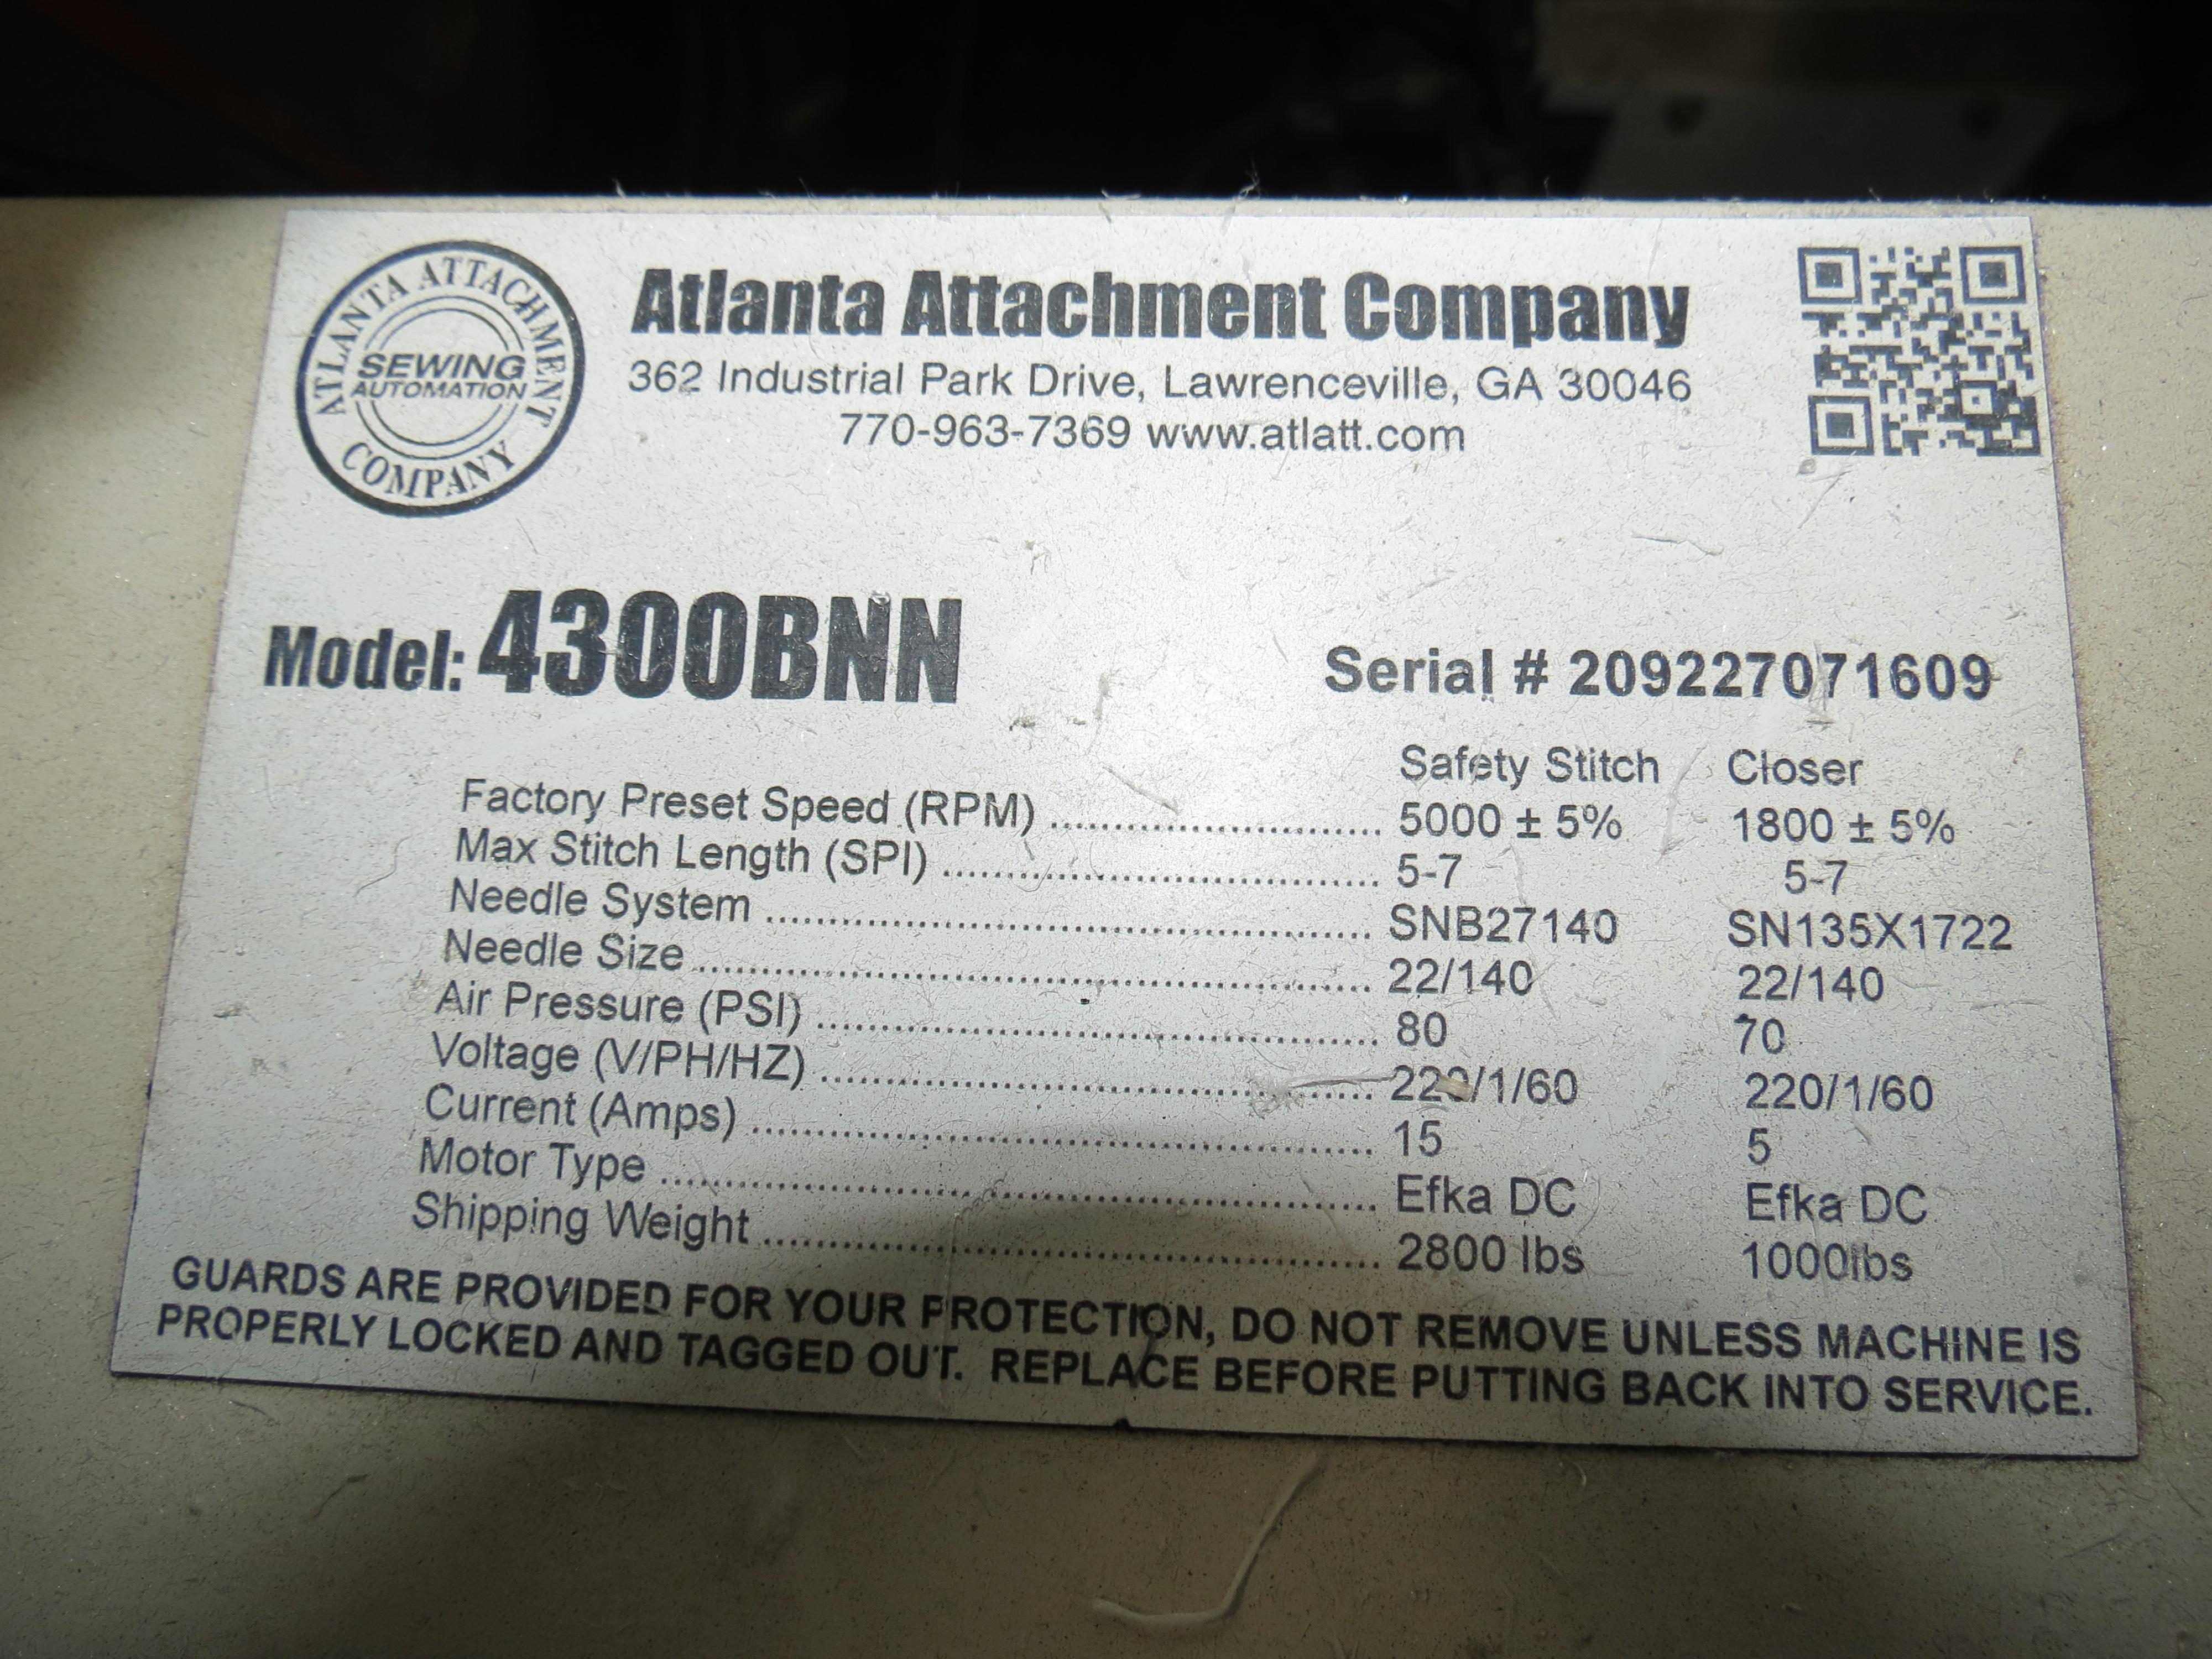 Atlanta Attachment Company, 4300BBorder/Attach Handles Sewing Machine, 220V, SN:209227071609, Juki - Image 11 of 11